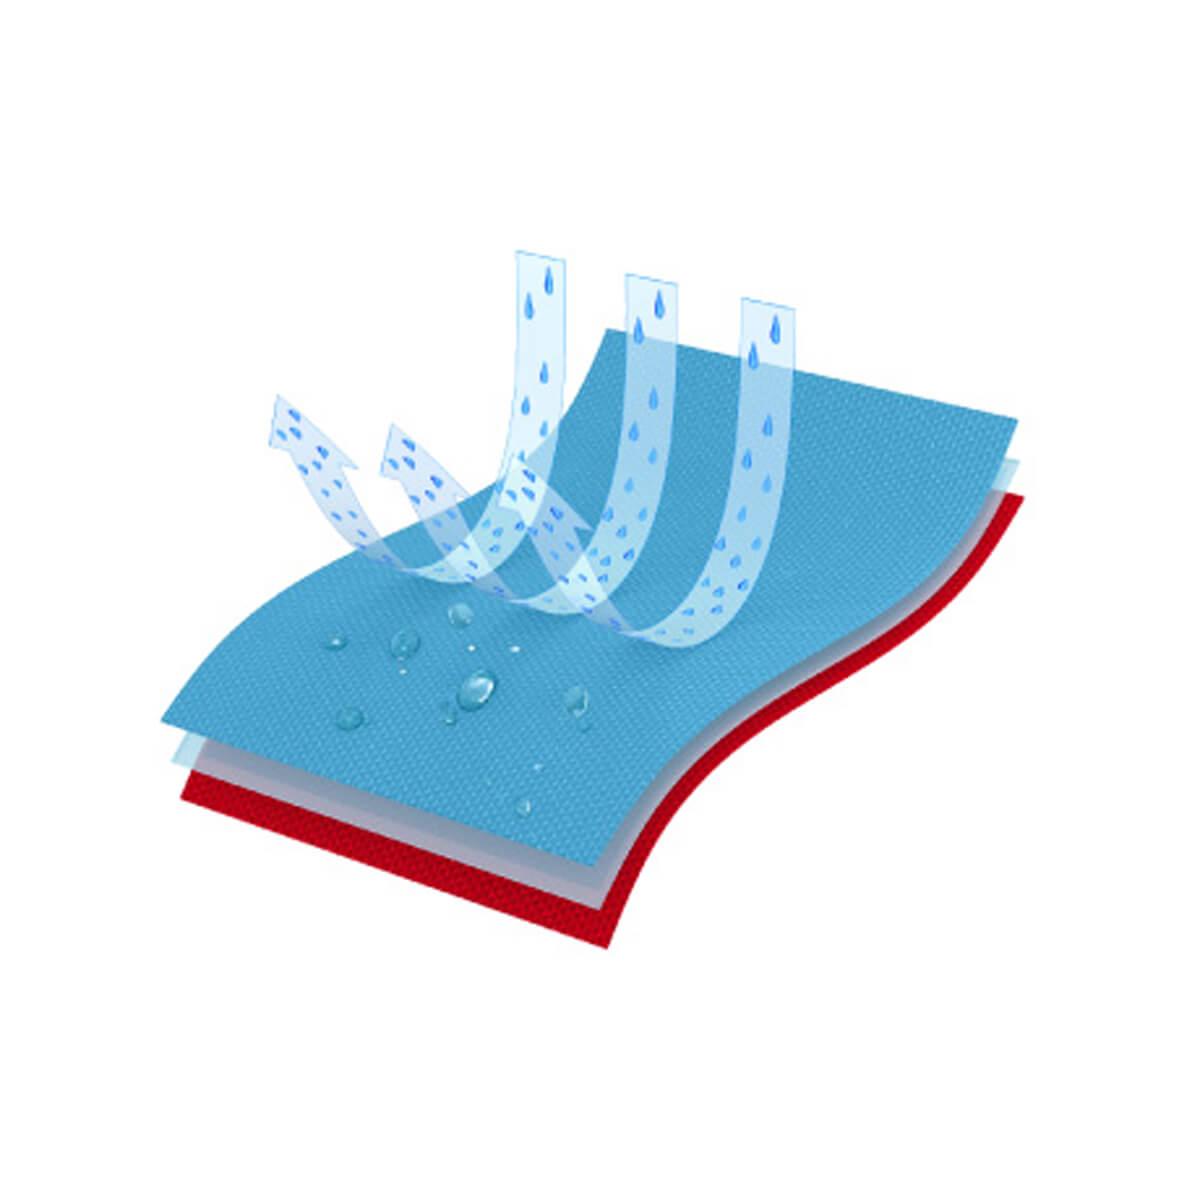 Sympatex 100% Polyester Membrane Laminate | TALAS